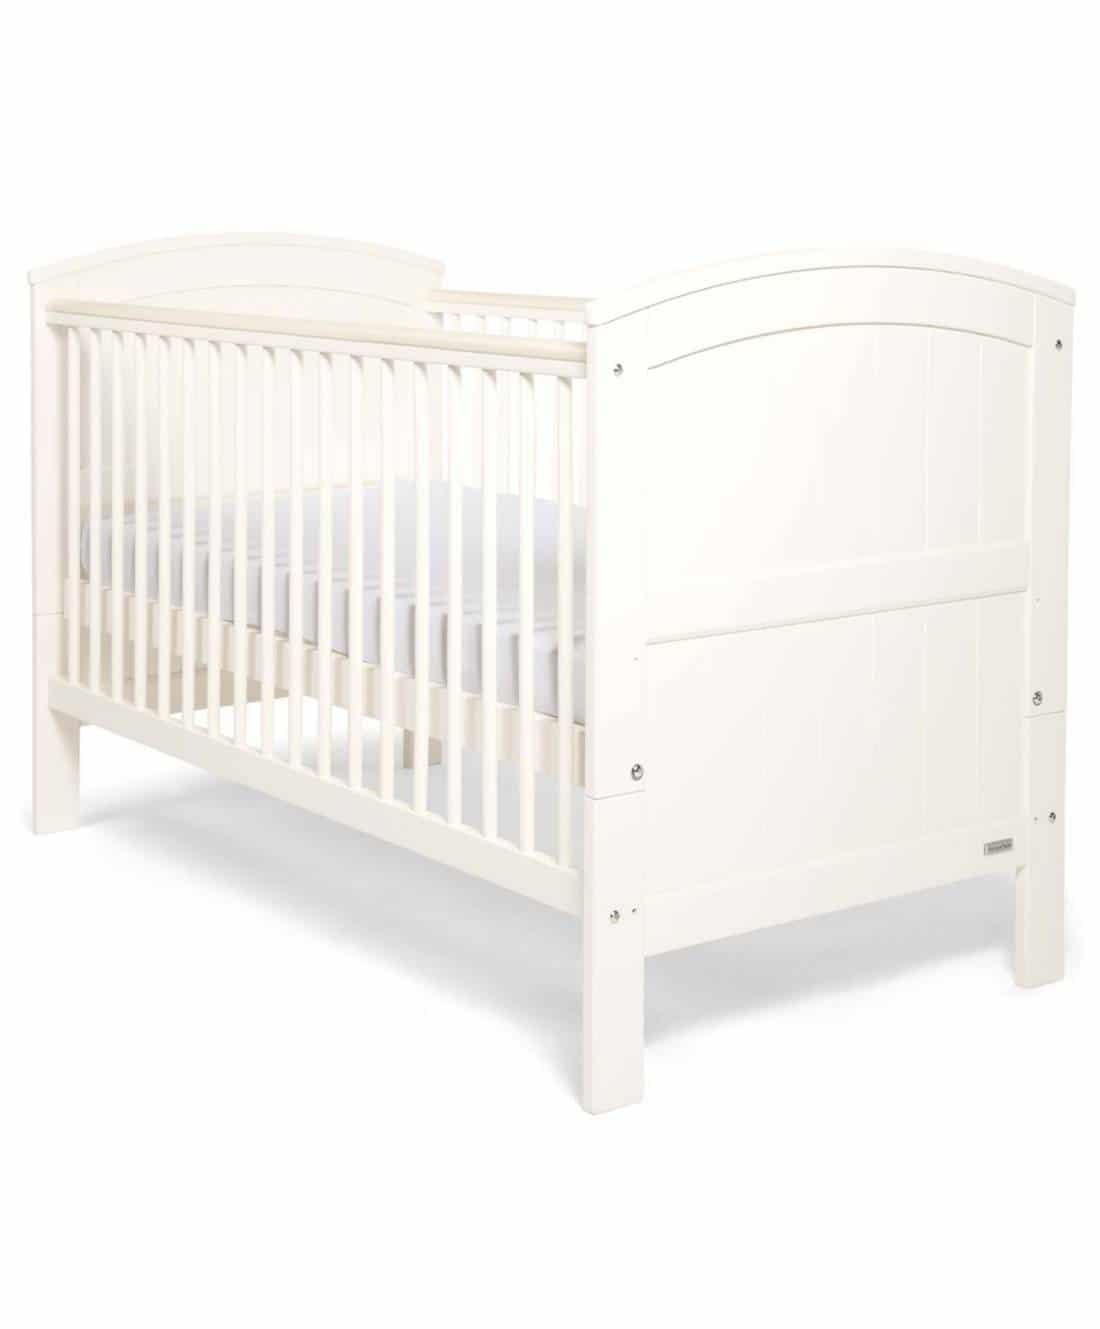 e3fed4553ee MAMAS&PAPAS Κρεβάτι Hayworth Ivory - Bebe Home